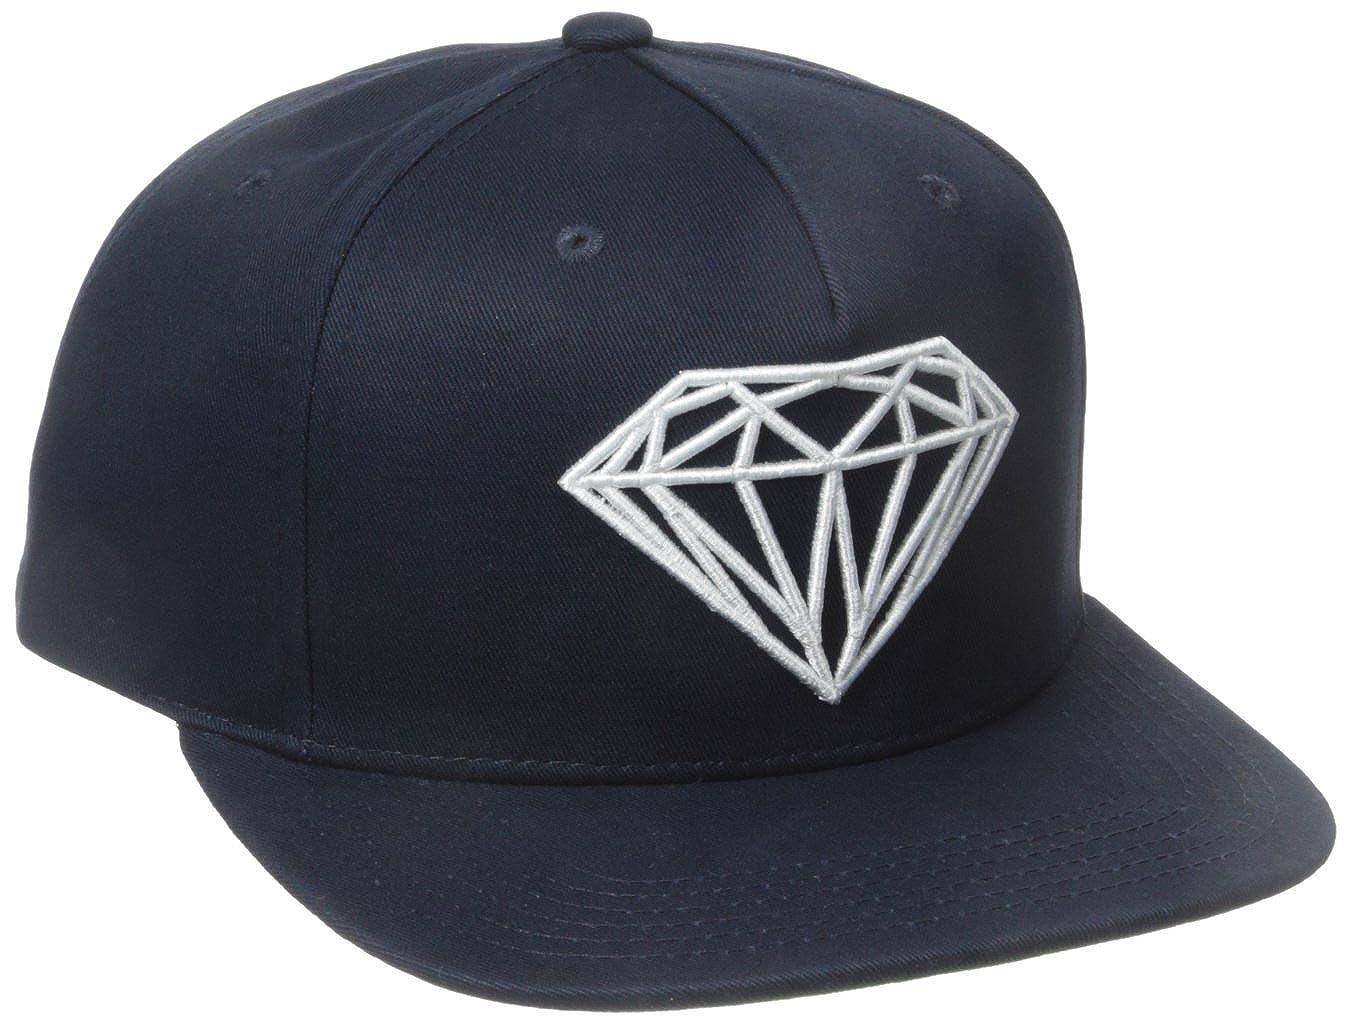 competitive price bcdec 2e95c ... usa amazon diamond supply co. mens brilliant snapback black one size  clothing 7b2f9 aa285